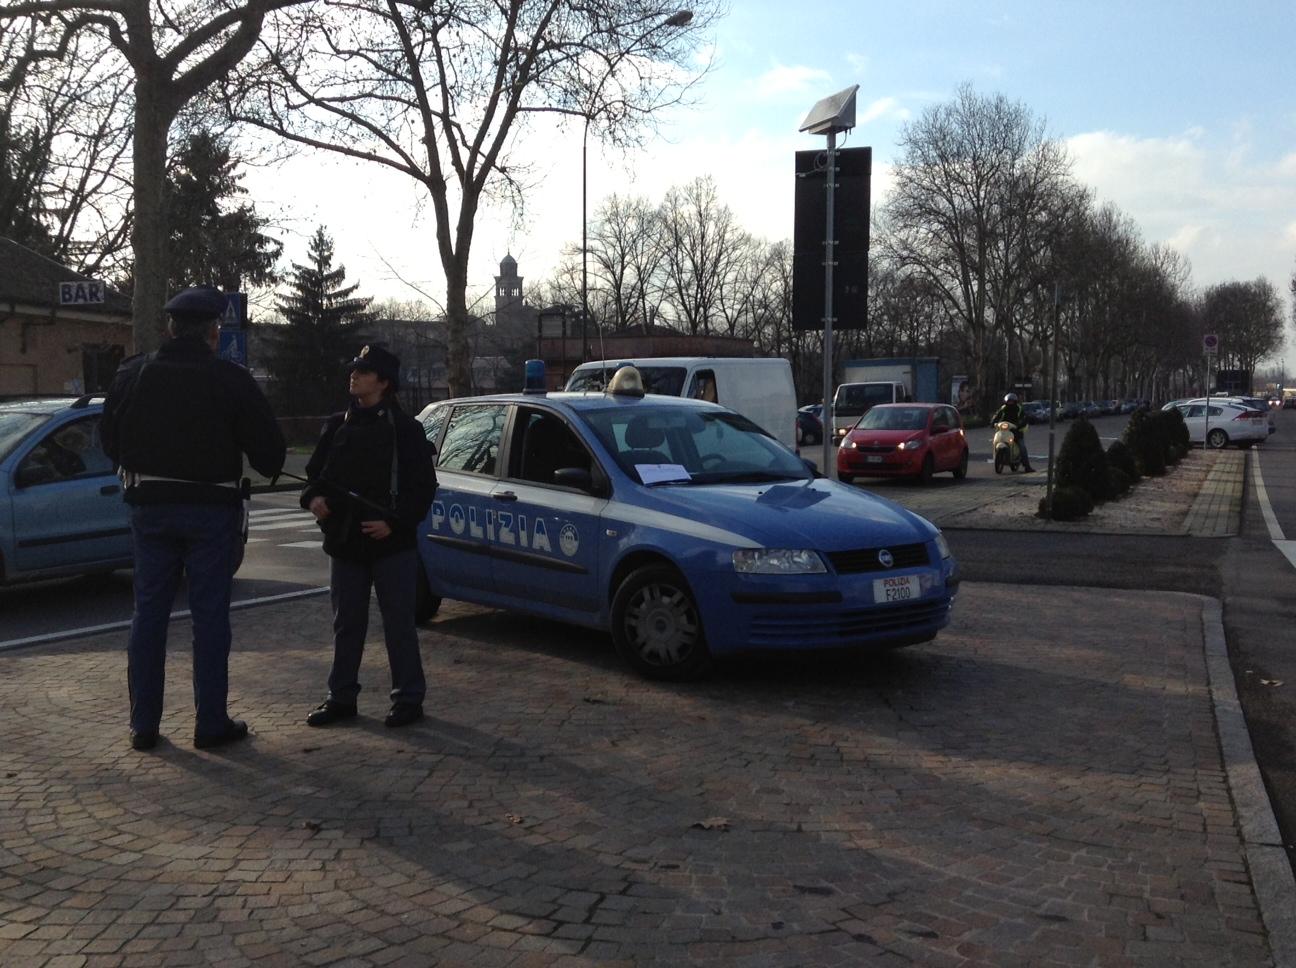 controlli interforze a Barriera Milano (1)